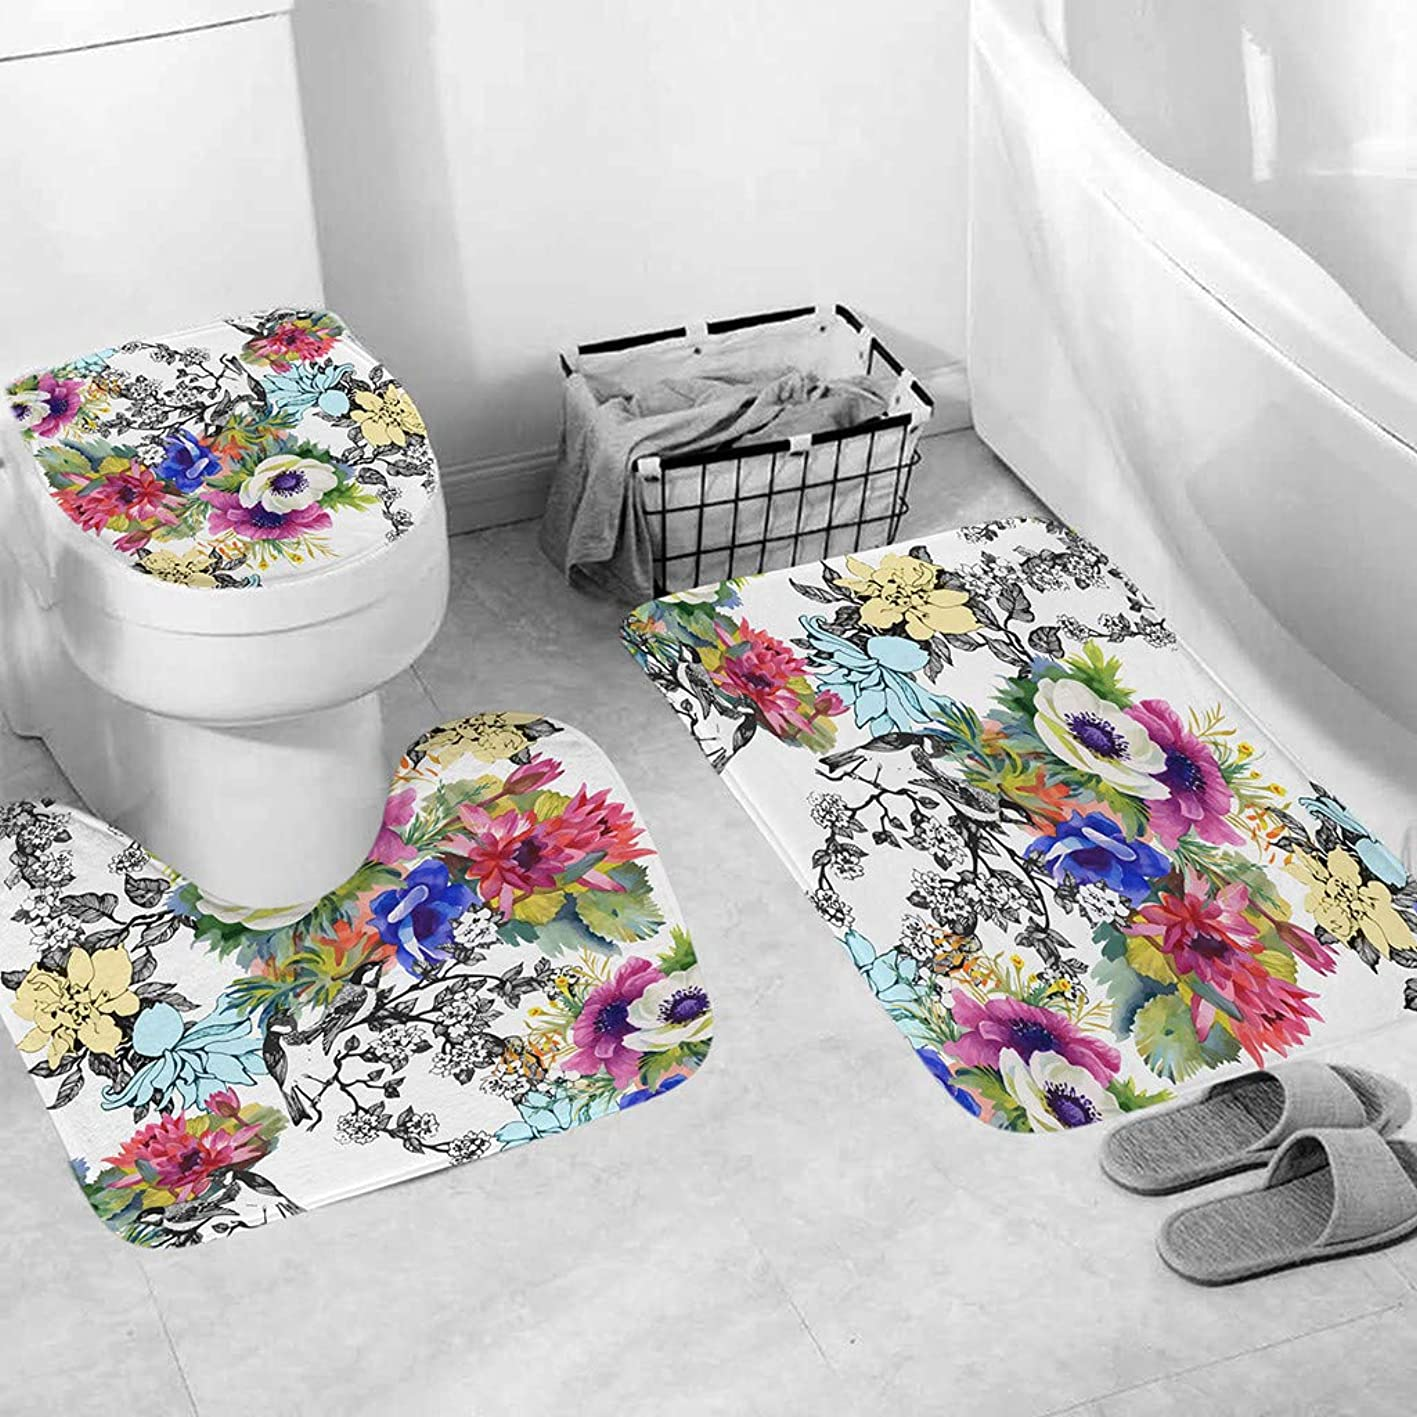 OrchidAmor 3pcs Non-Slip Bath Mat Bathroom Kitchen Carpet Doormats Decor 2019 New Fashion kmqphfolpiw933